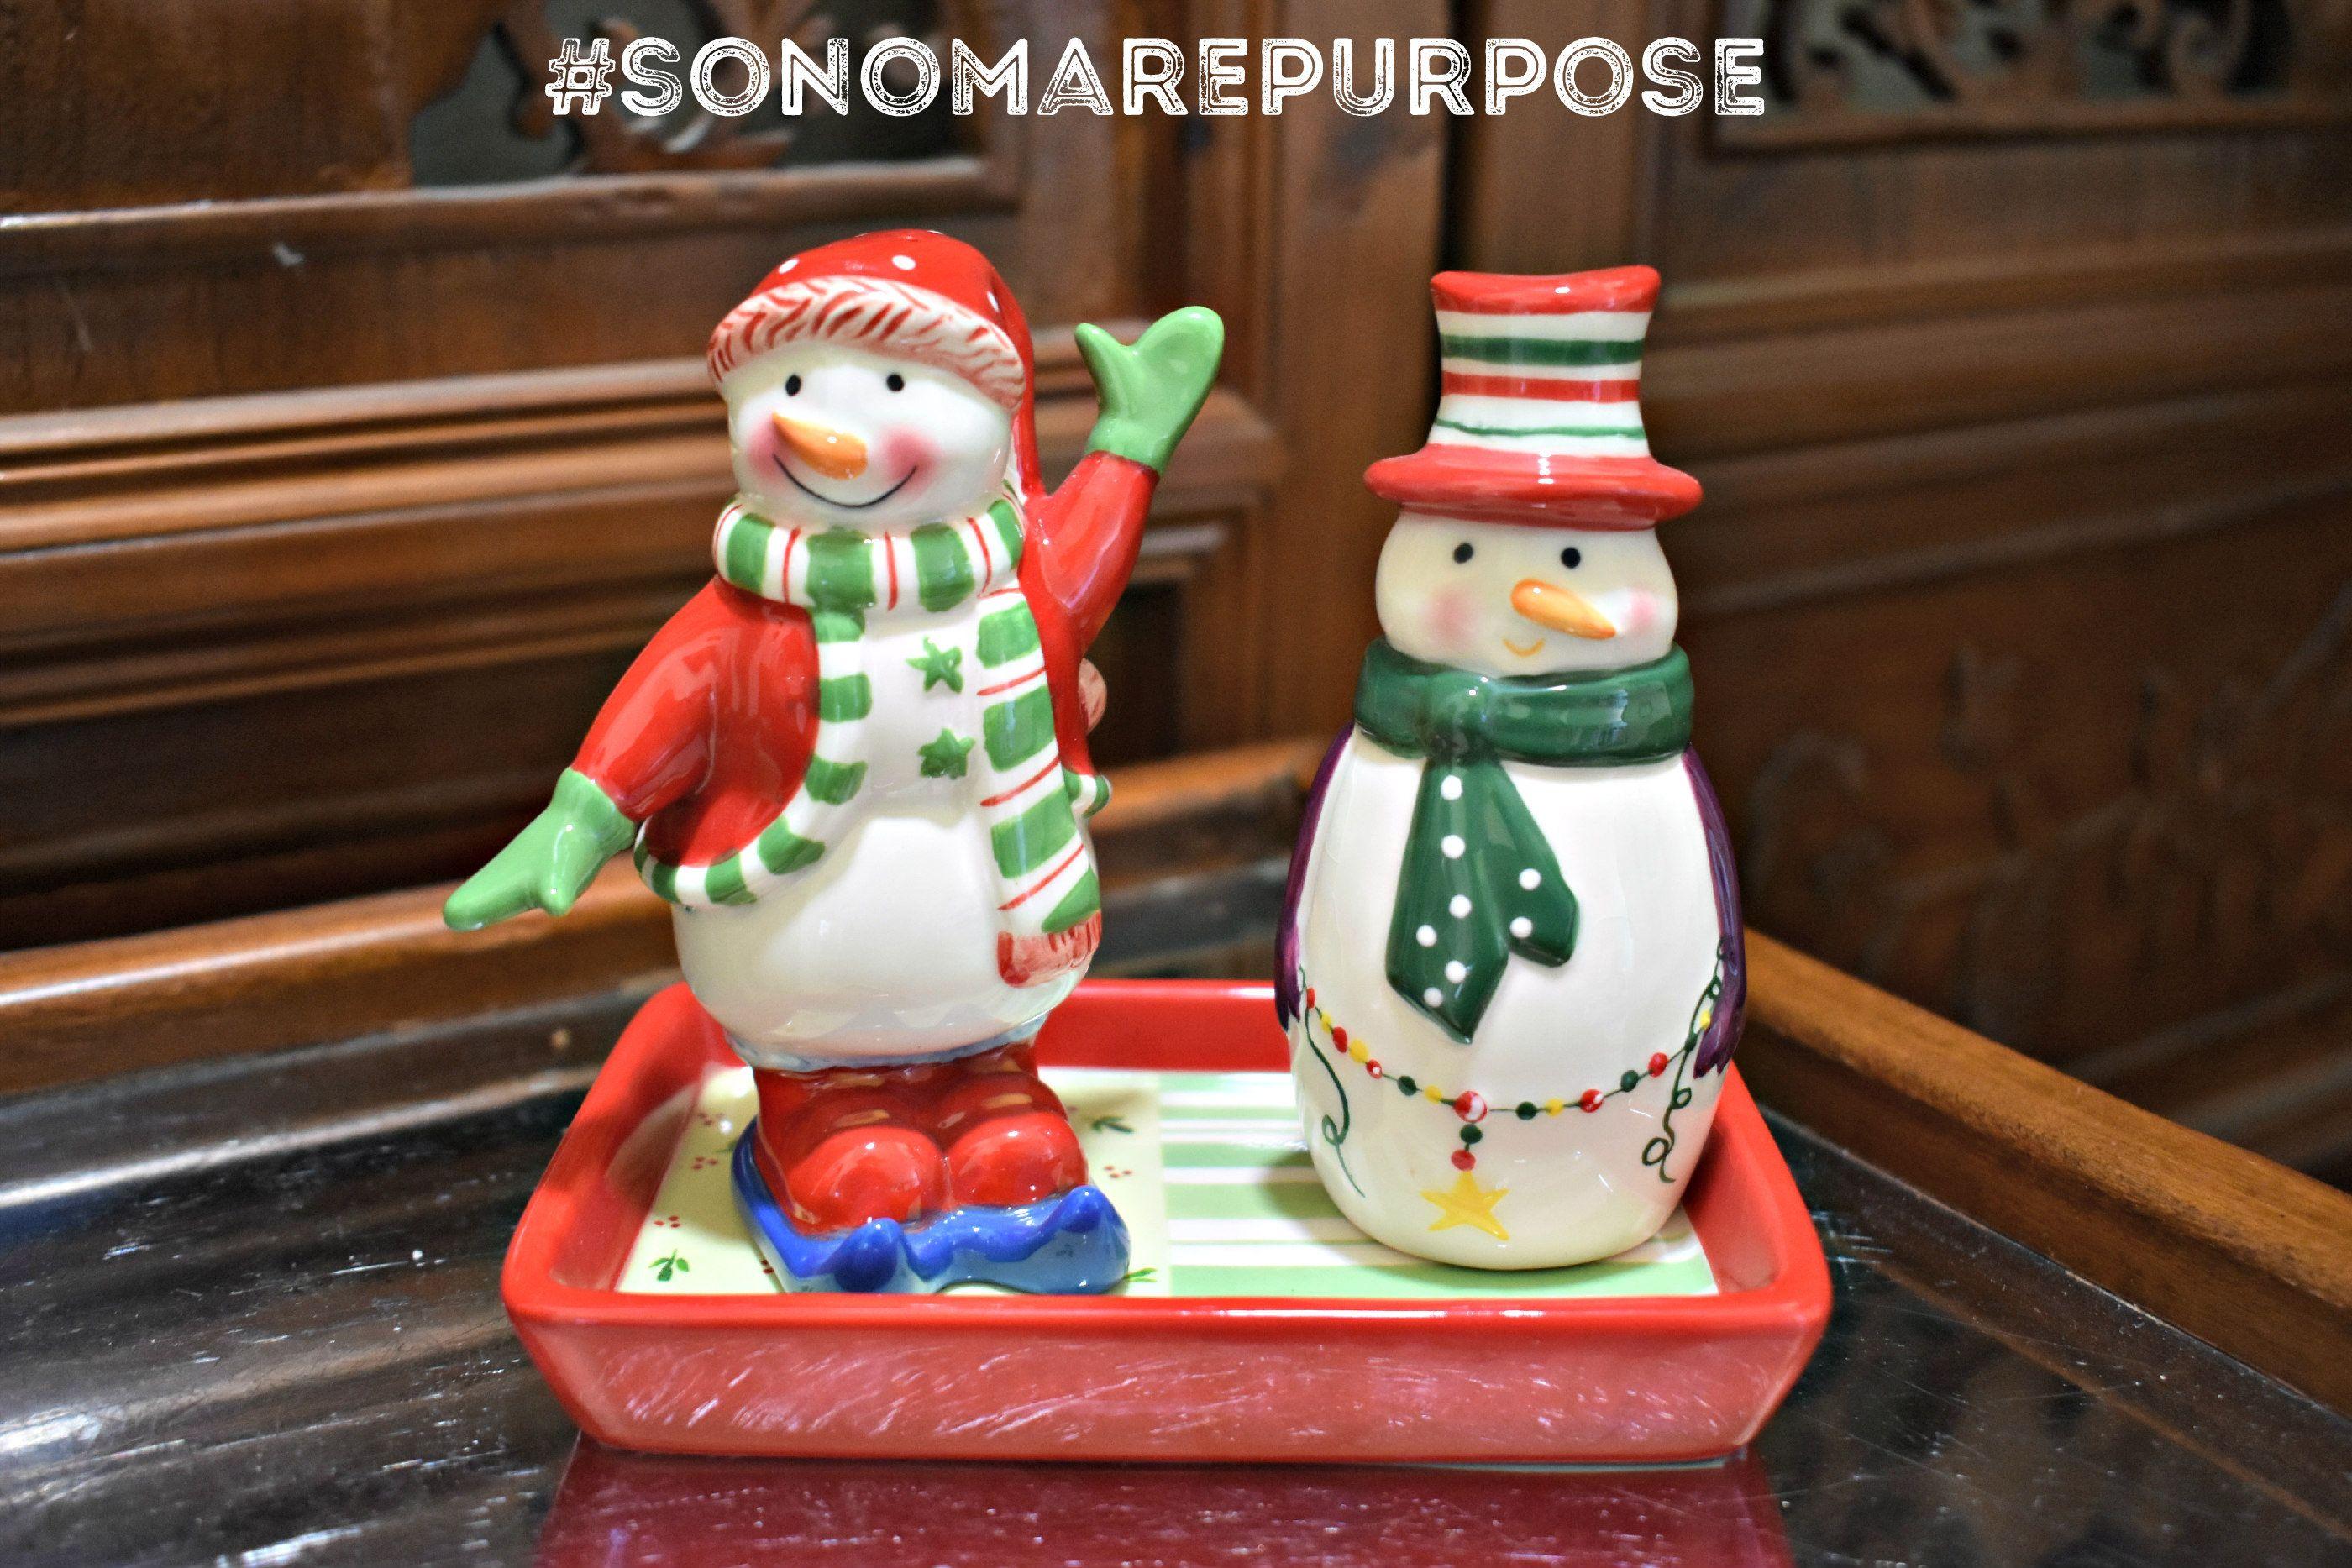 Ganz Christmas Snowman Salt pepper shaker with tray 3 pc set, Salt & Pepper, Ganz Christmas Salt and Pepper Shakers, Snowman Decorations